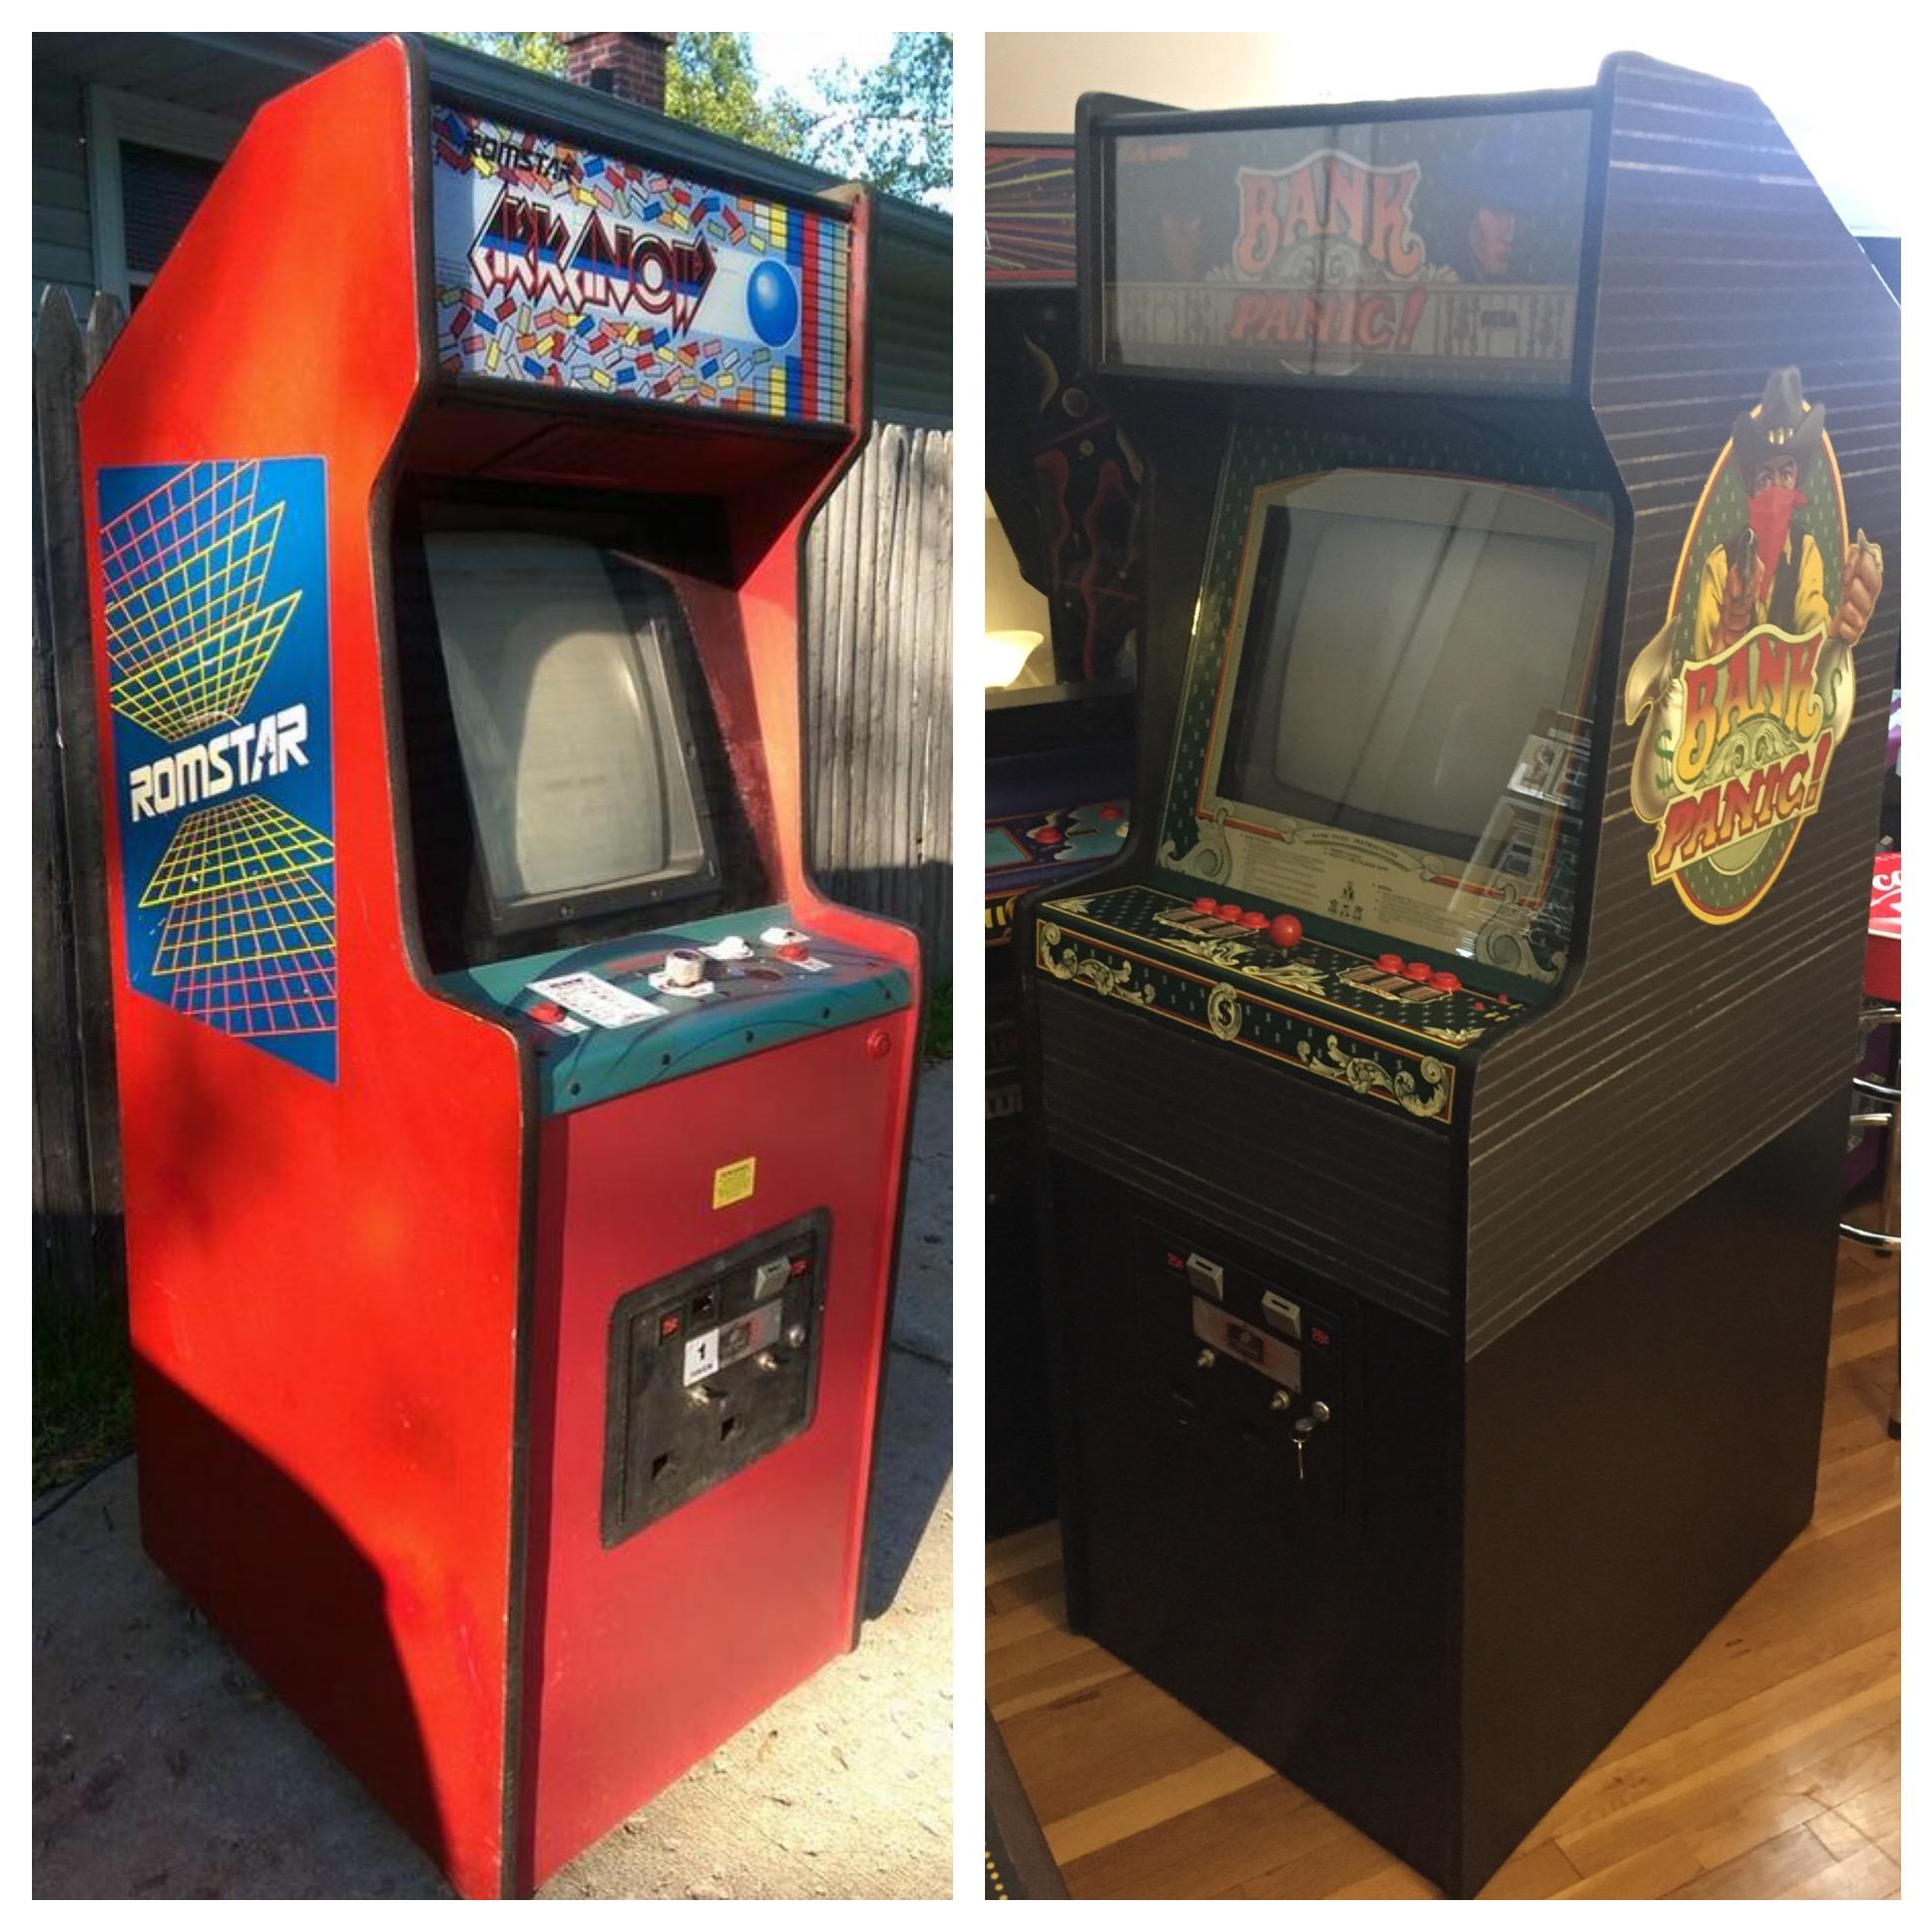 Ross's Bank Panic Arcade Restoration – Arcade Marquee Dot Com